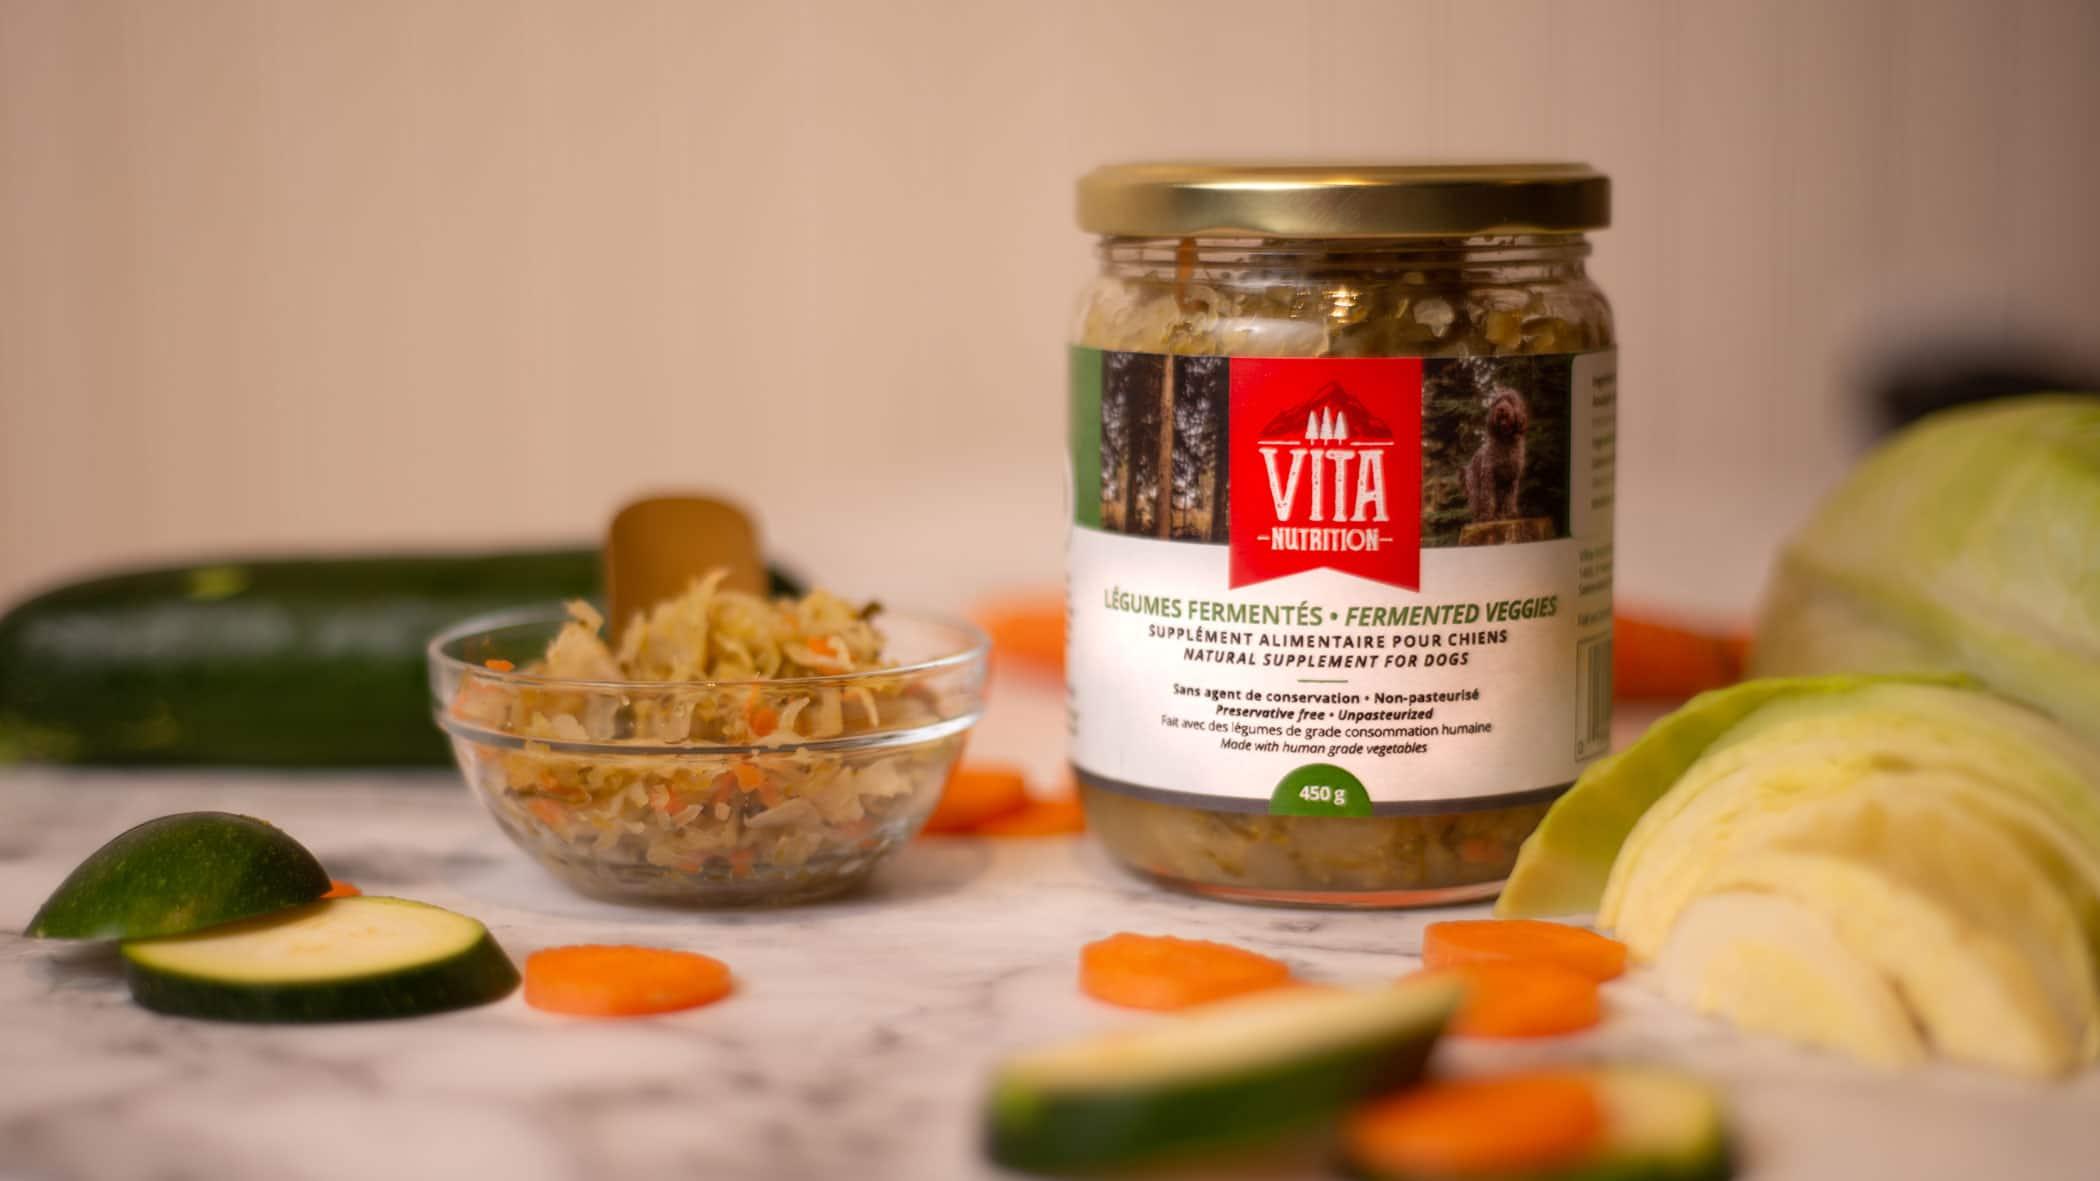 vita nutrition animale advantages of fermented veggies